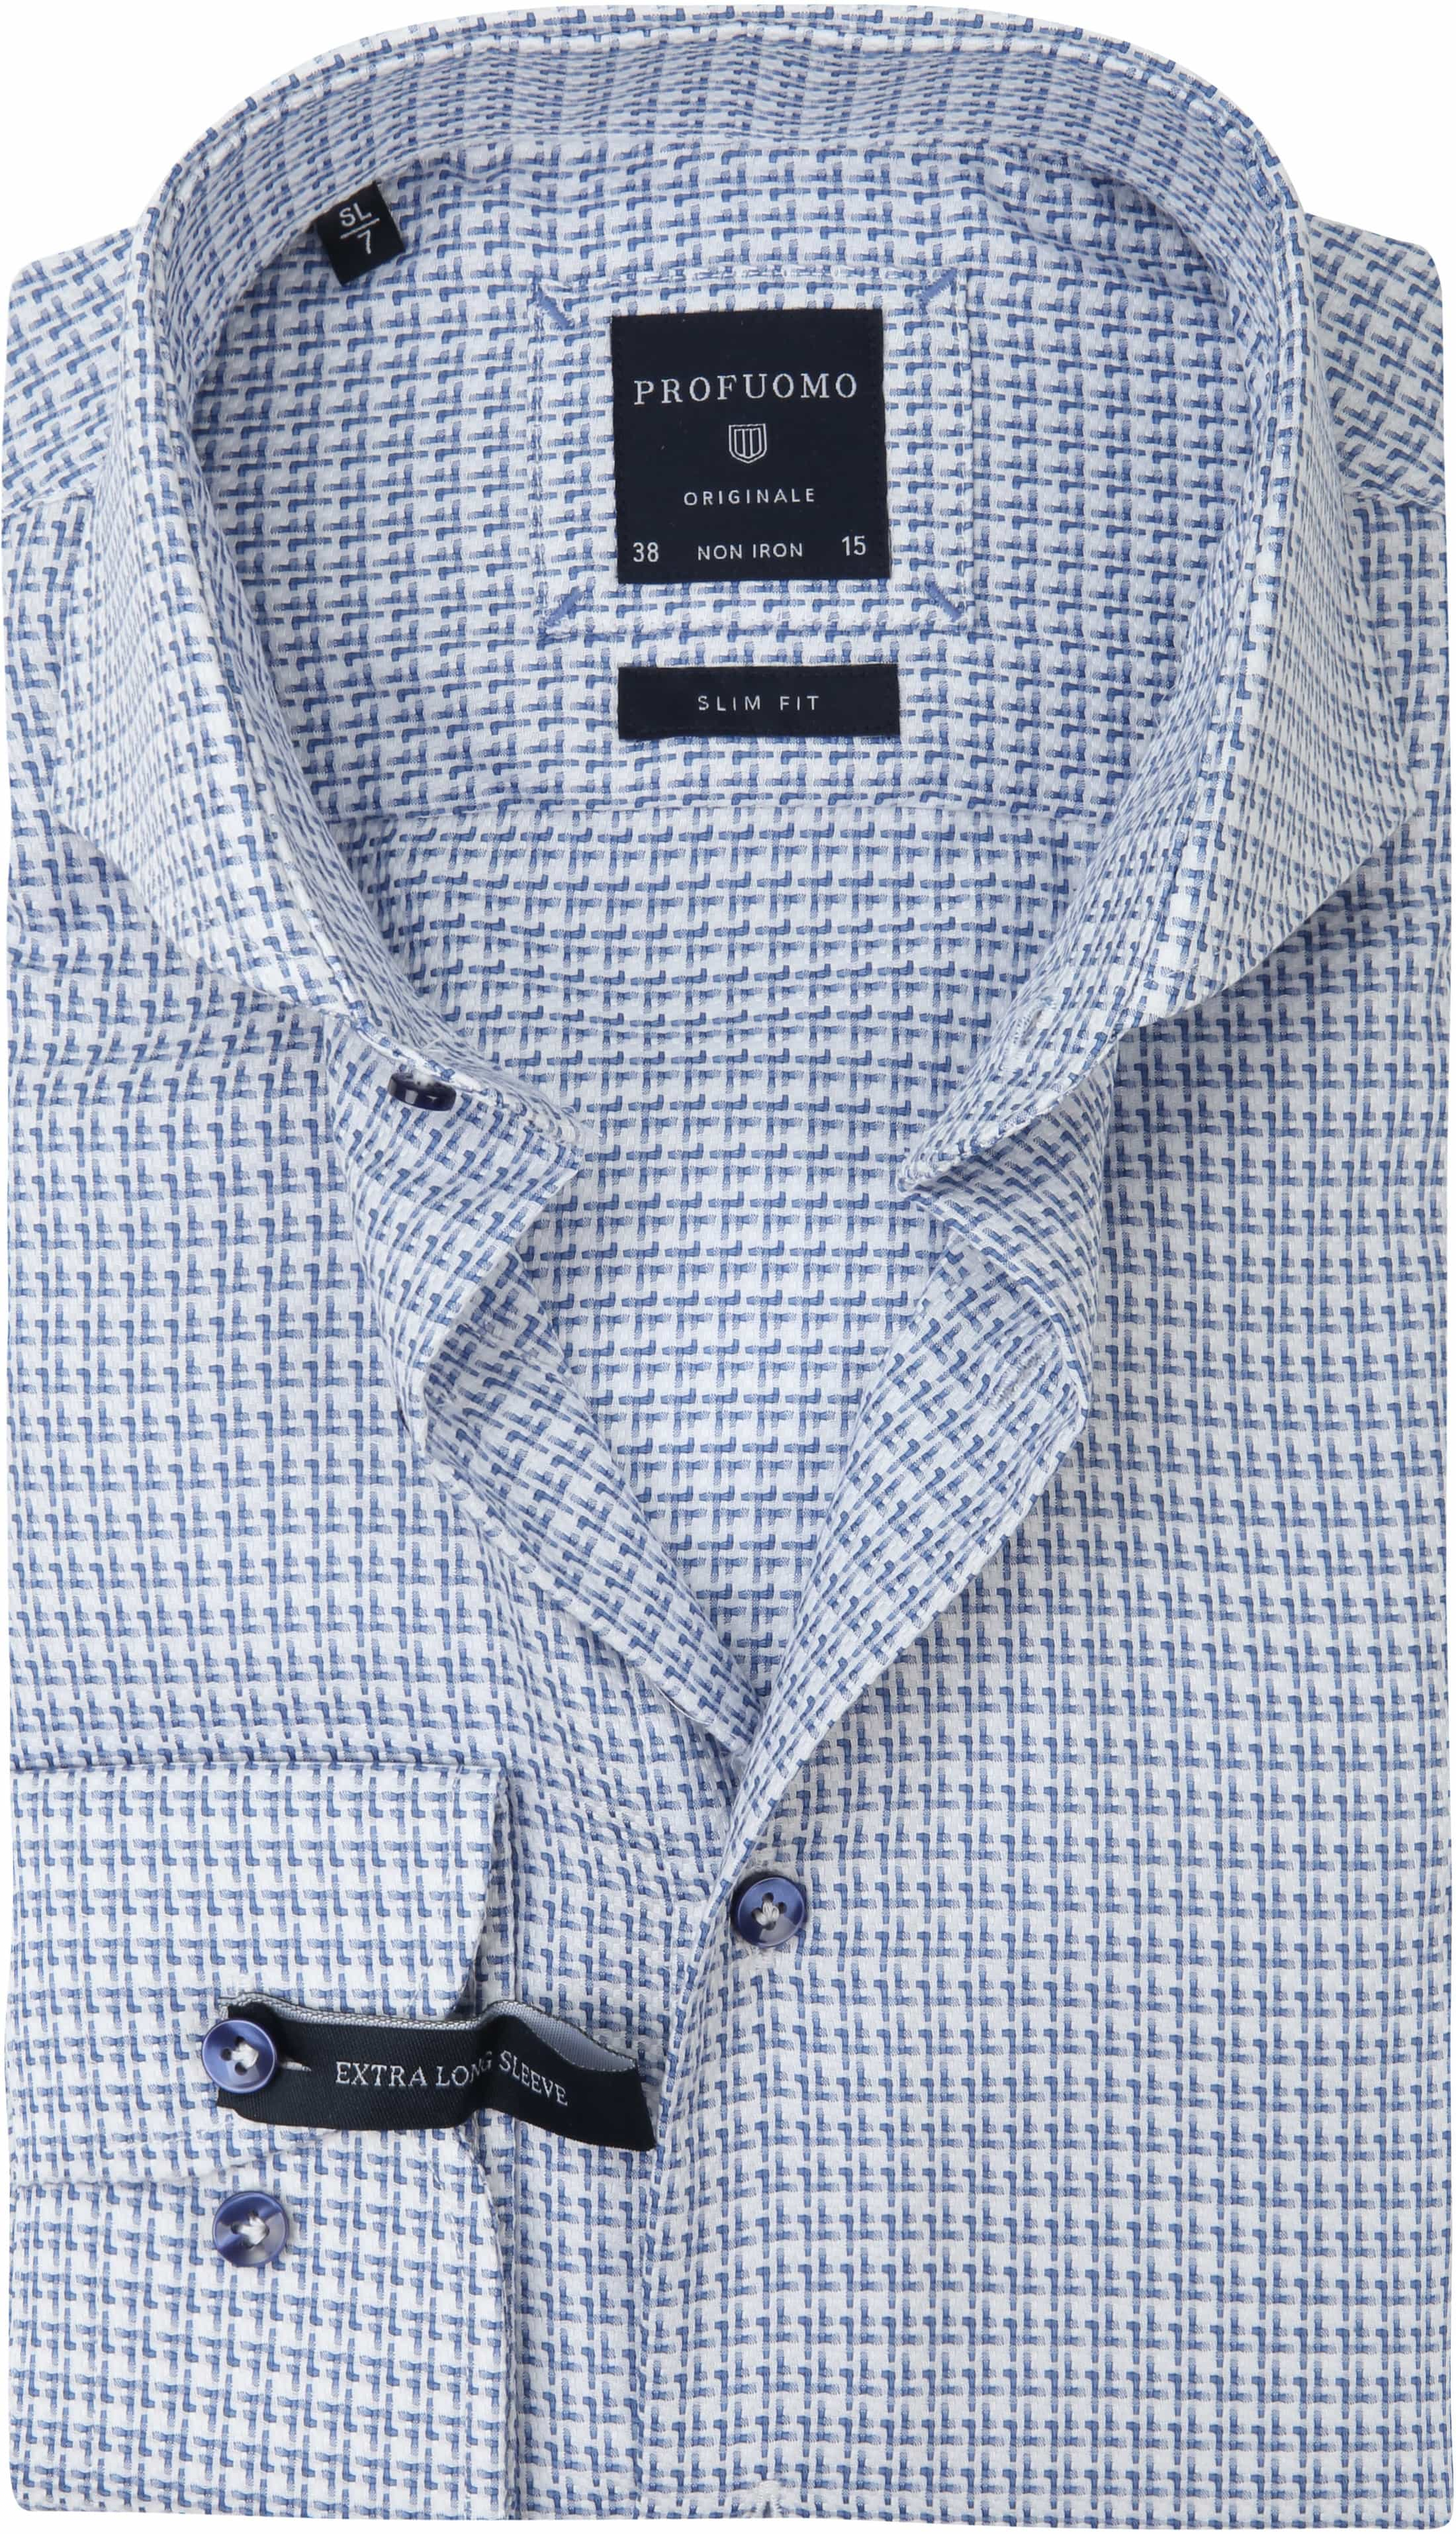 Profuomo Overhemd Blauw Dessin SL7 foto 0